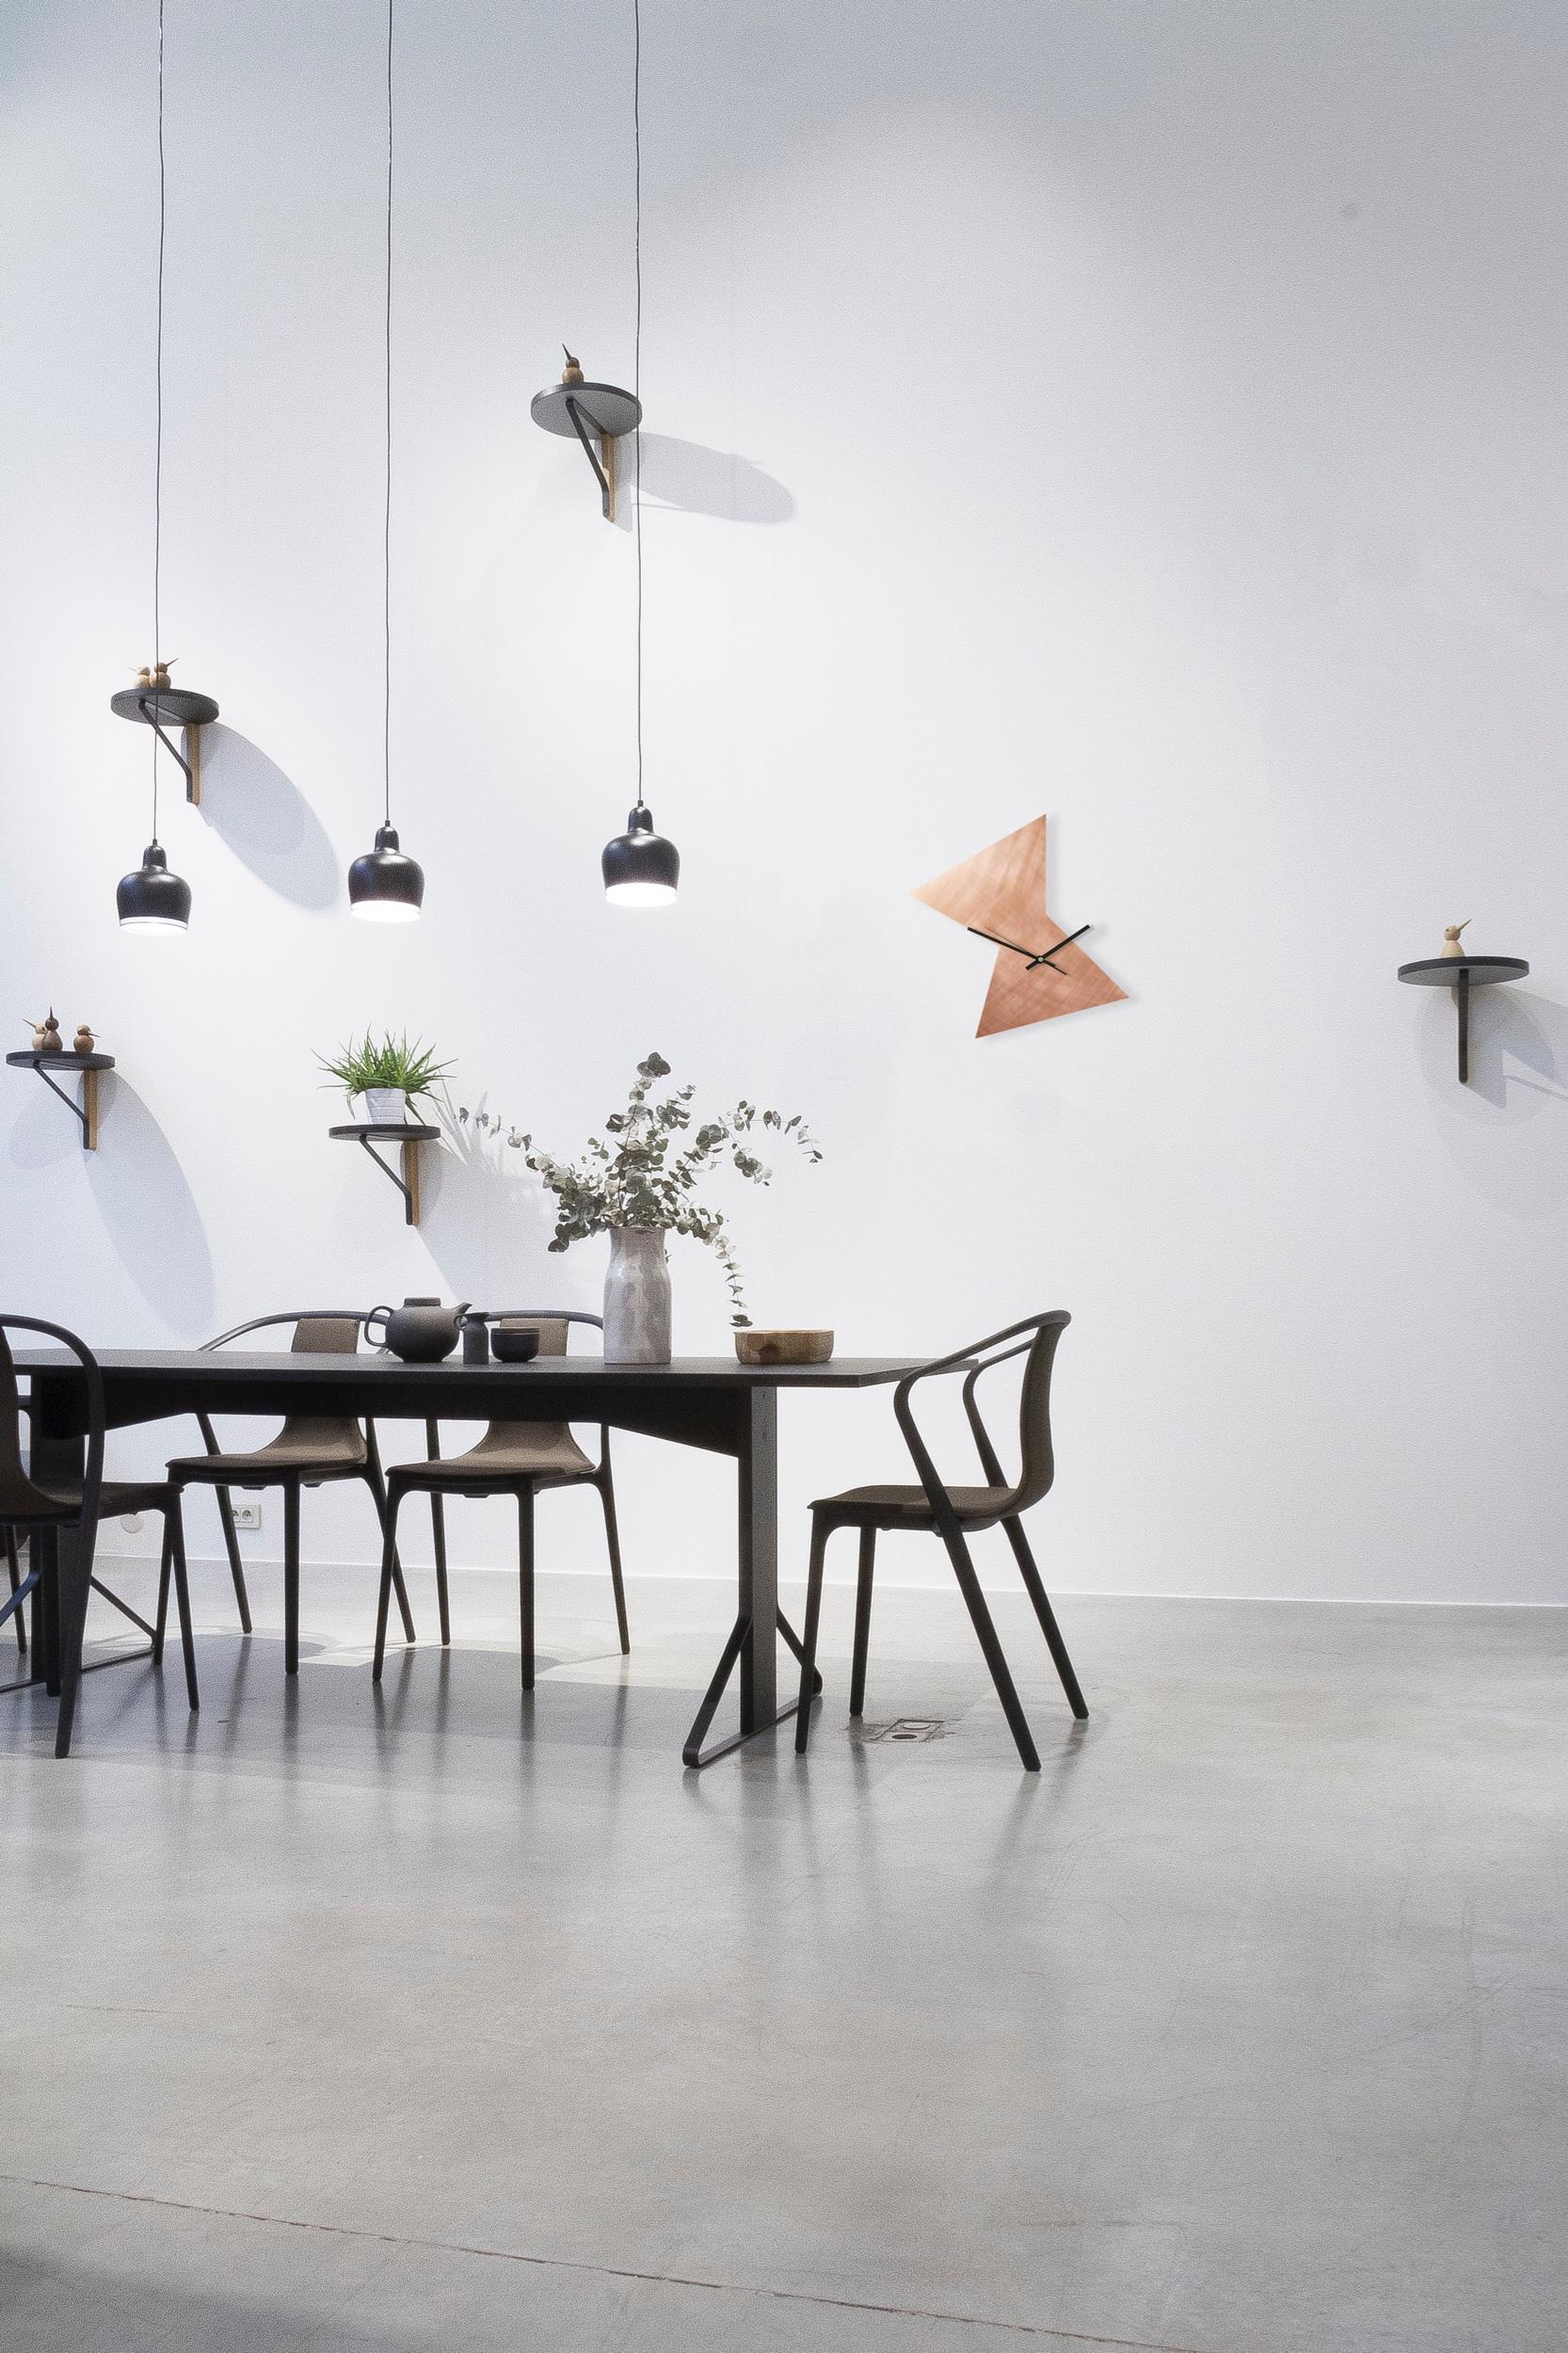 Dreieck Kupfer Uhr Interior Vitra.jpeg